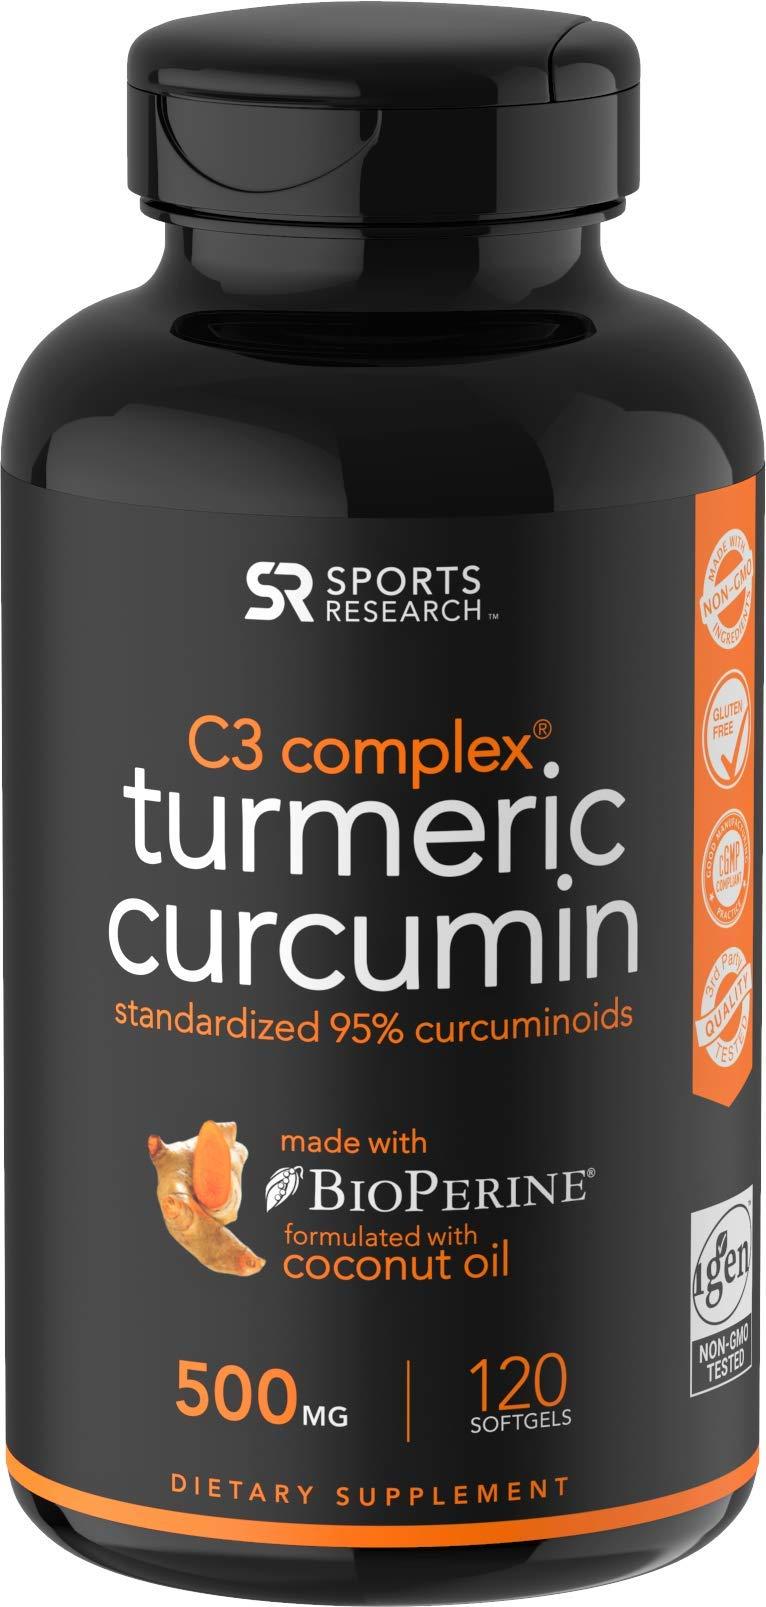 Turmeric Curcumin Complex Enhanced Absorption